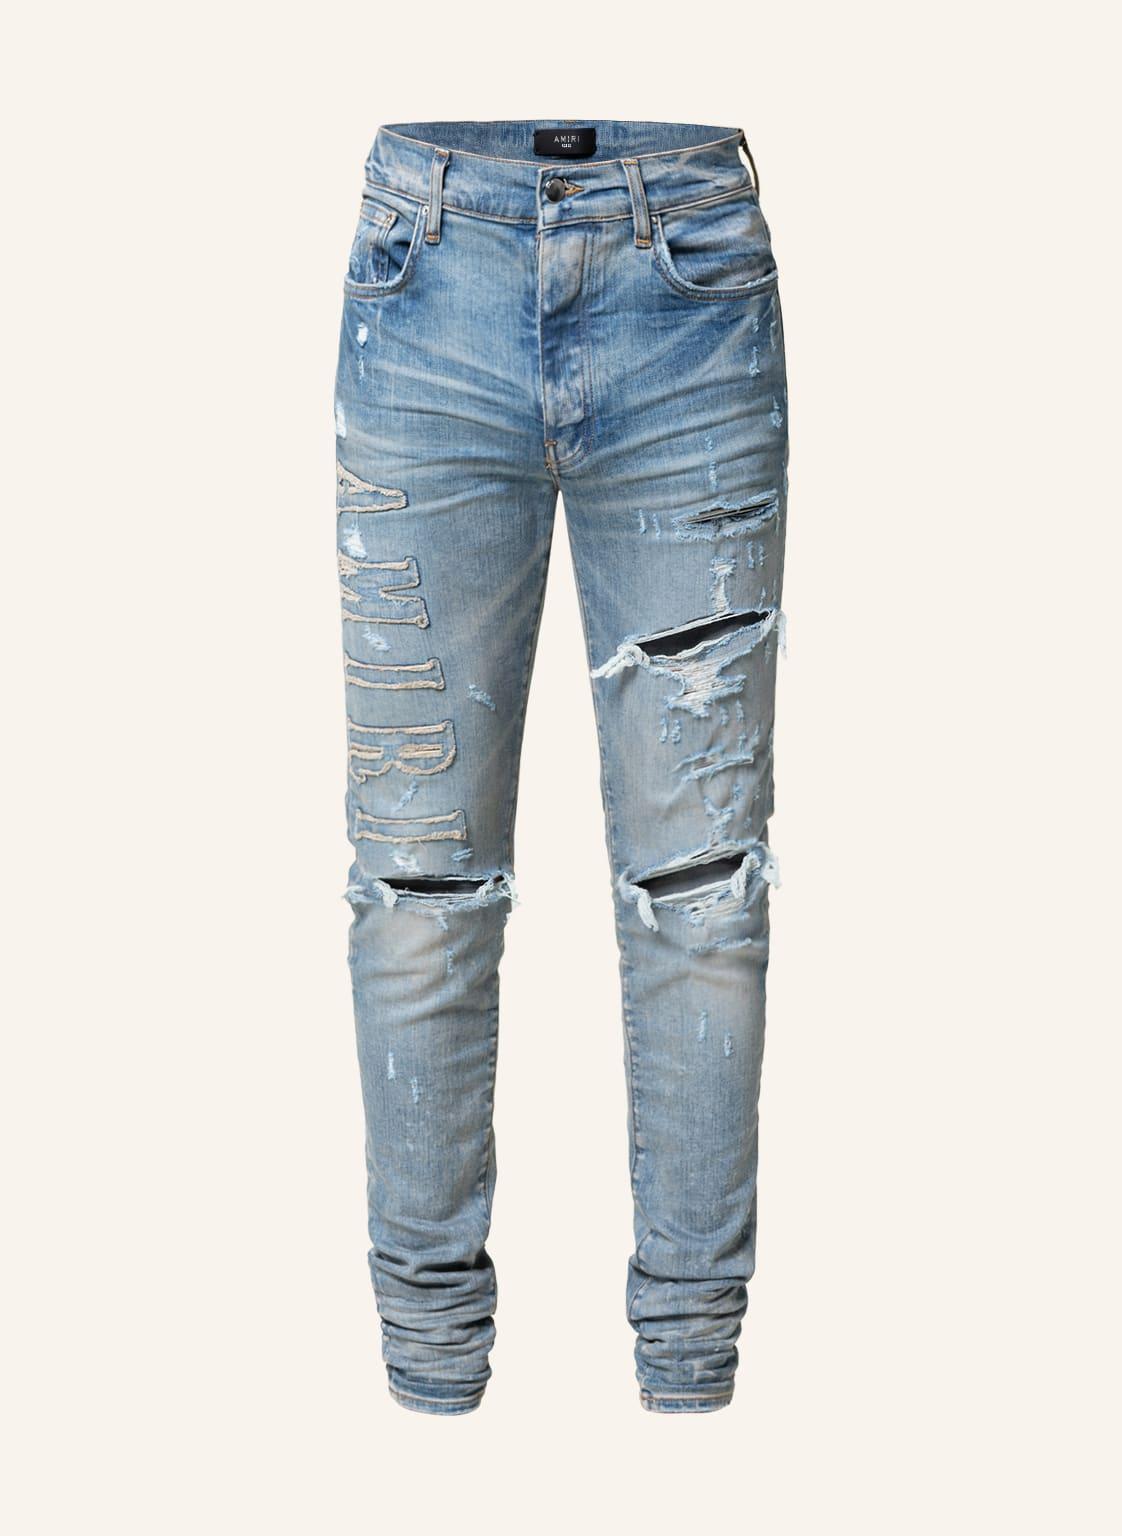 Image of Amiri Destroyed Jeans blau